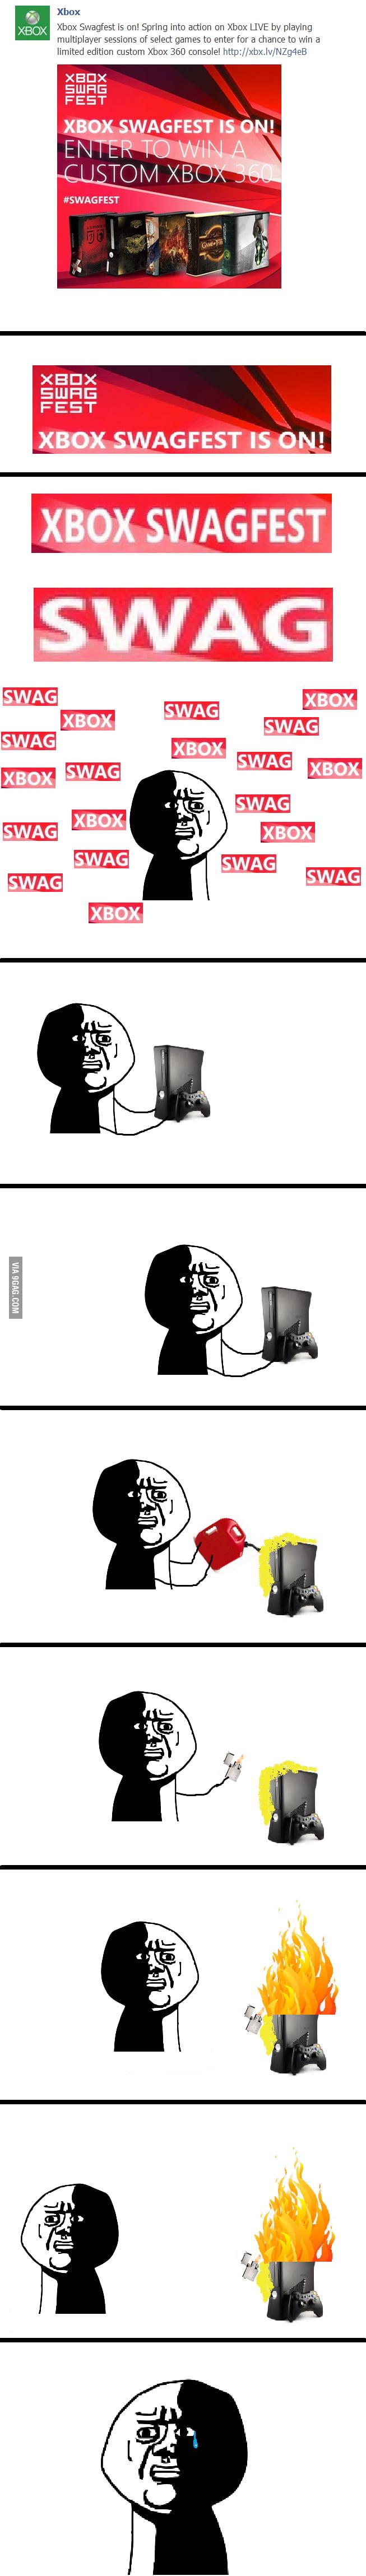 Xbox swagfest